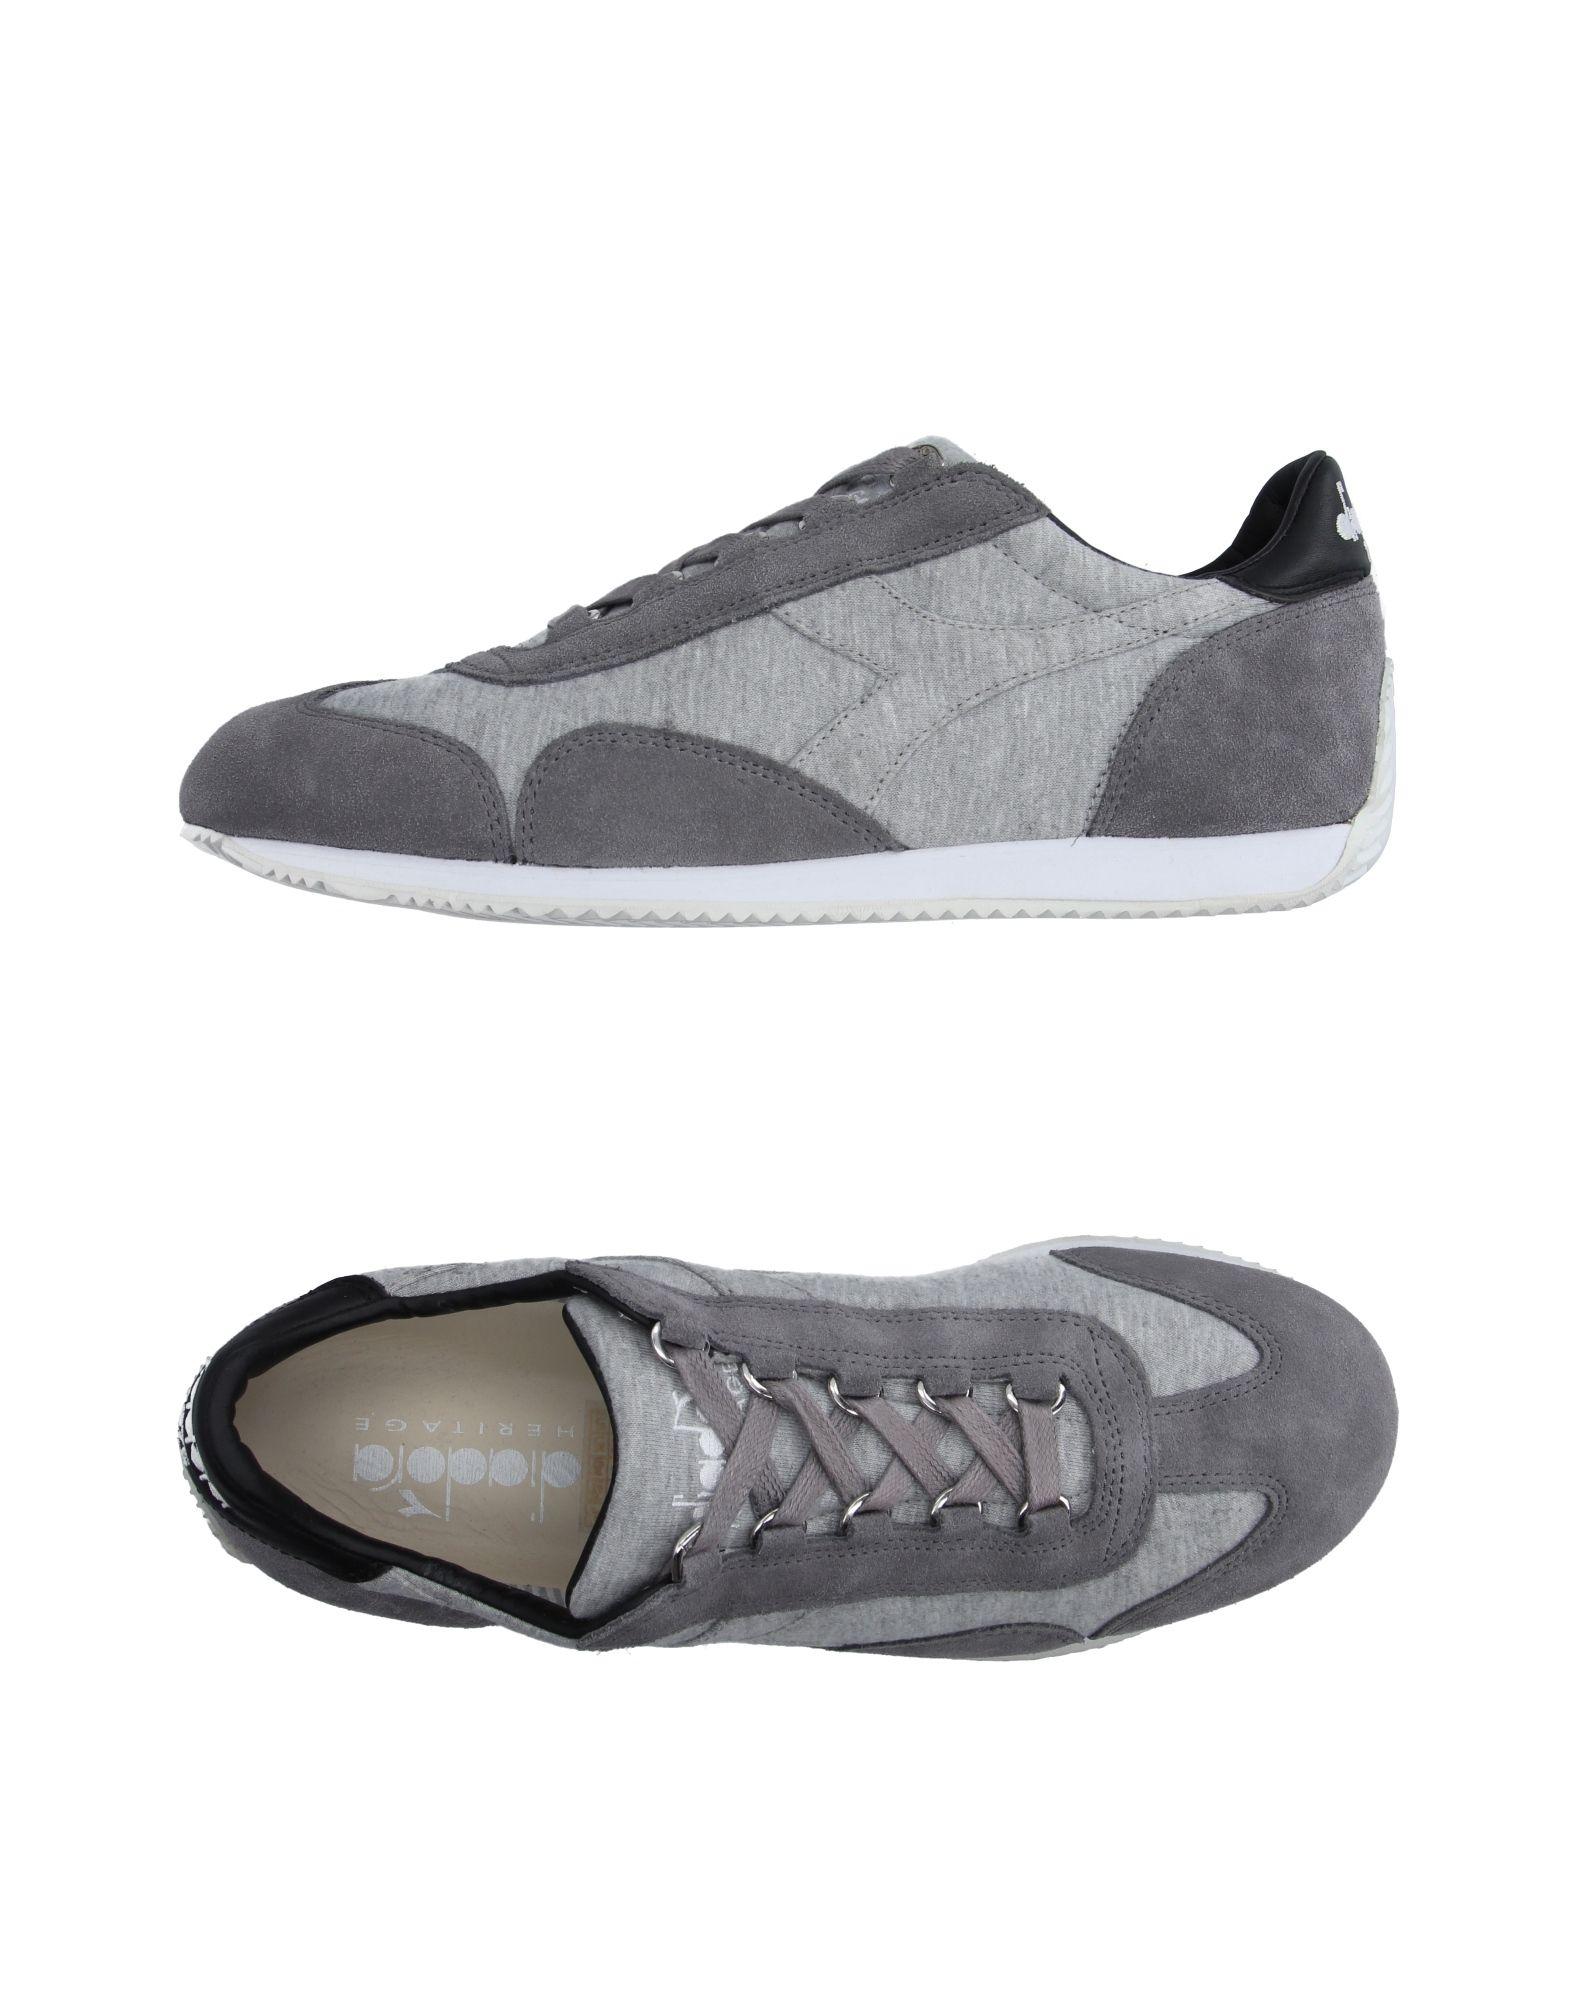 Diadora Diadora Diadora Heritage Sneakers Herren Gutes Preis-Leistungs-Verhältnis, es lohnt sich e31ac7